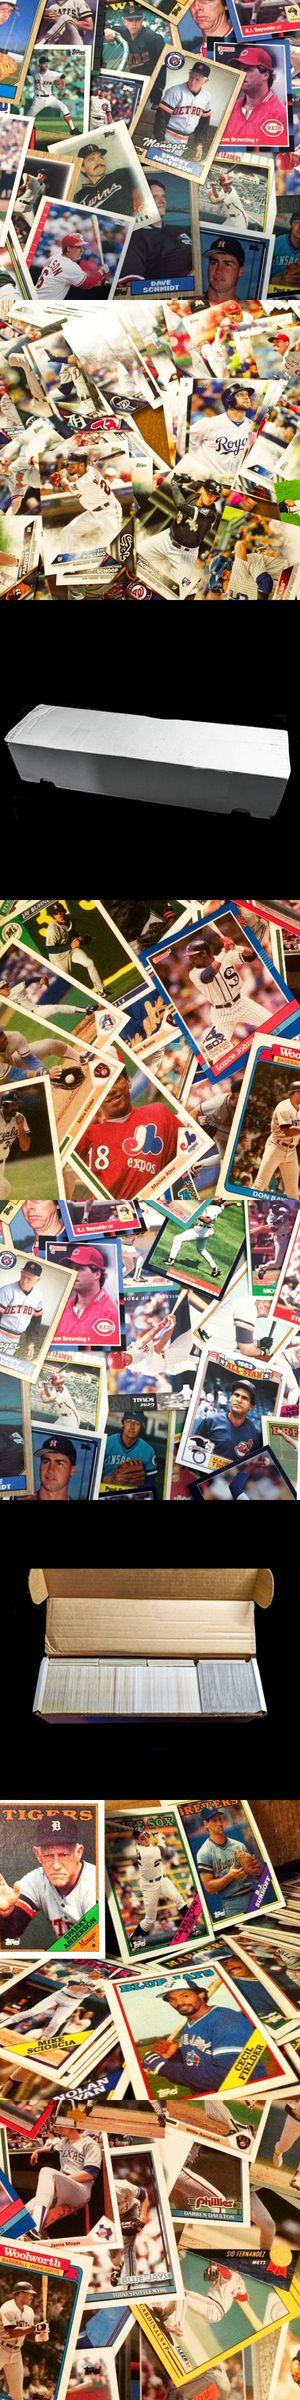 1700+ Used Baseball Card Box Lot for Sale in Arlington, WA